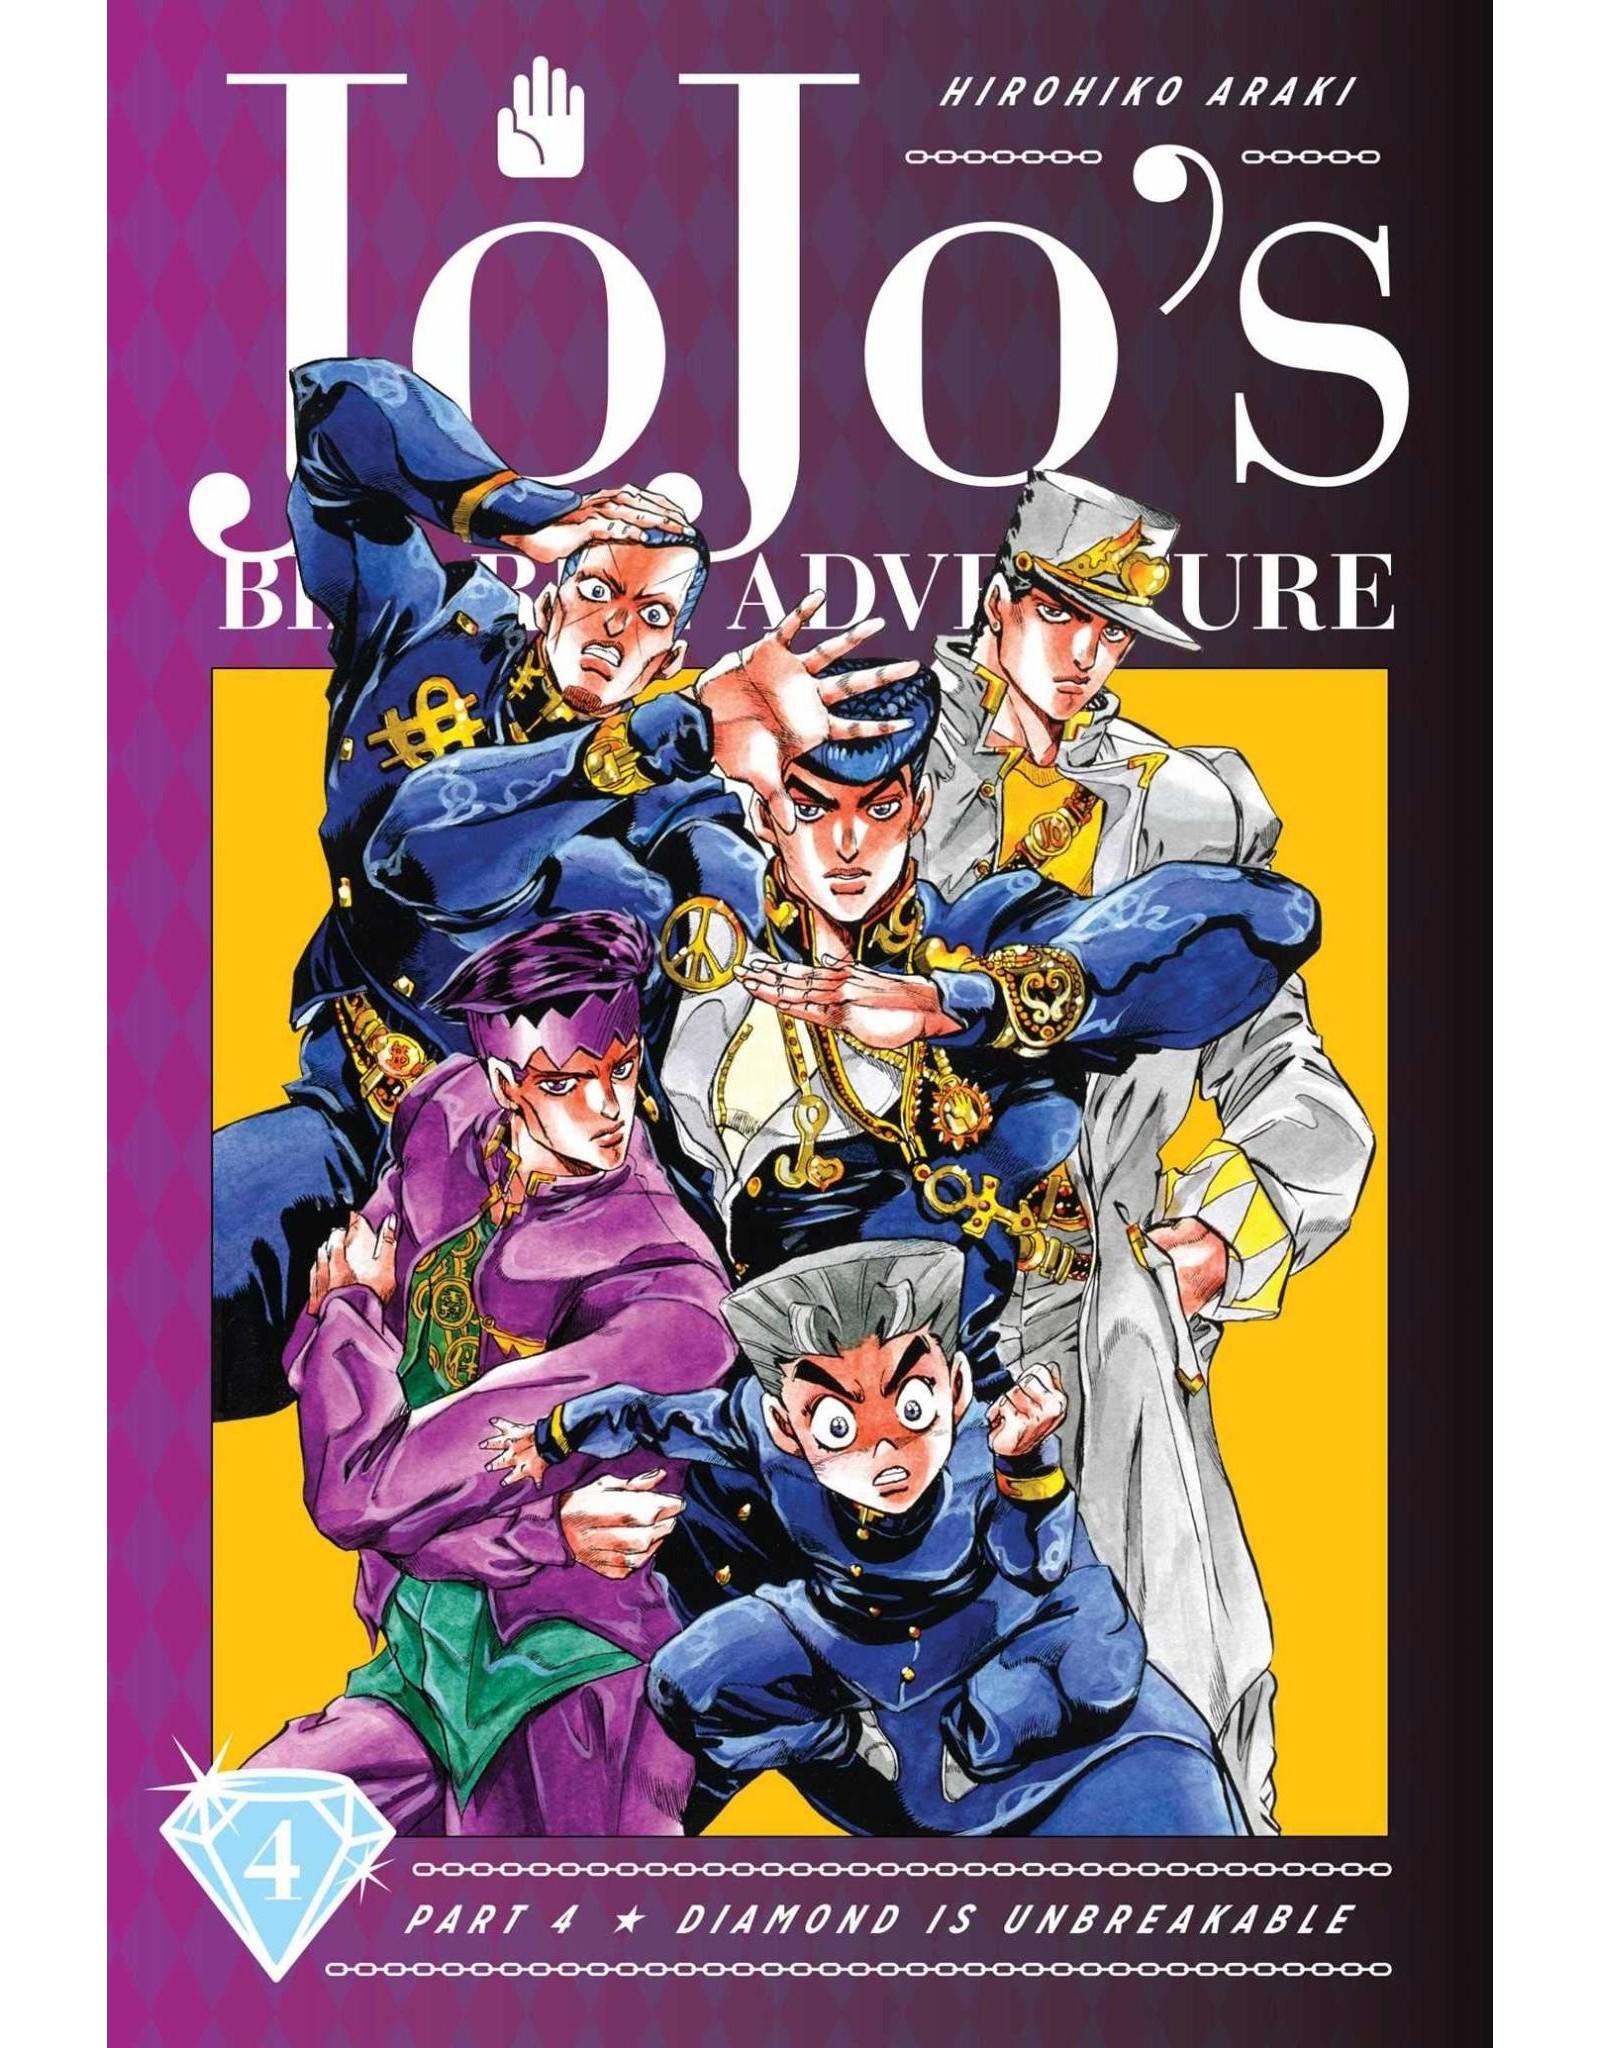 Jojo's Bizarre Adventure - Part 4: Diamond is Unbreakable - Volume 4 - Hardcover (English version)